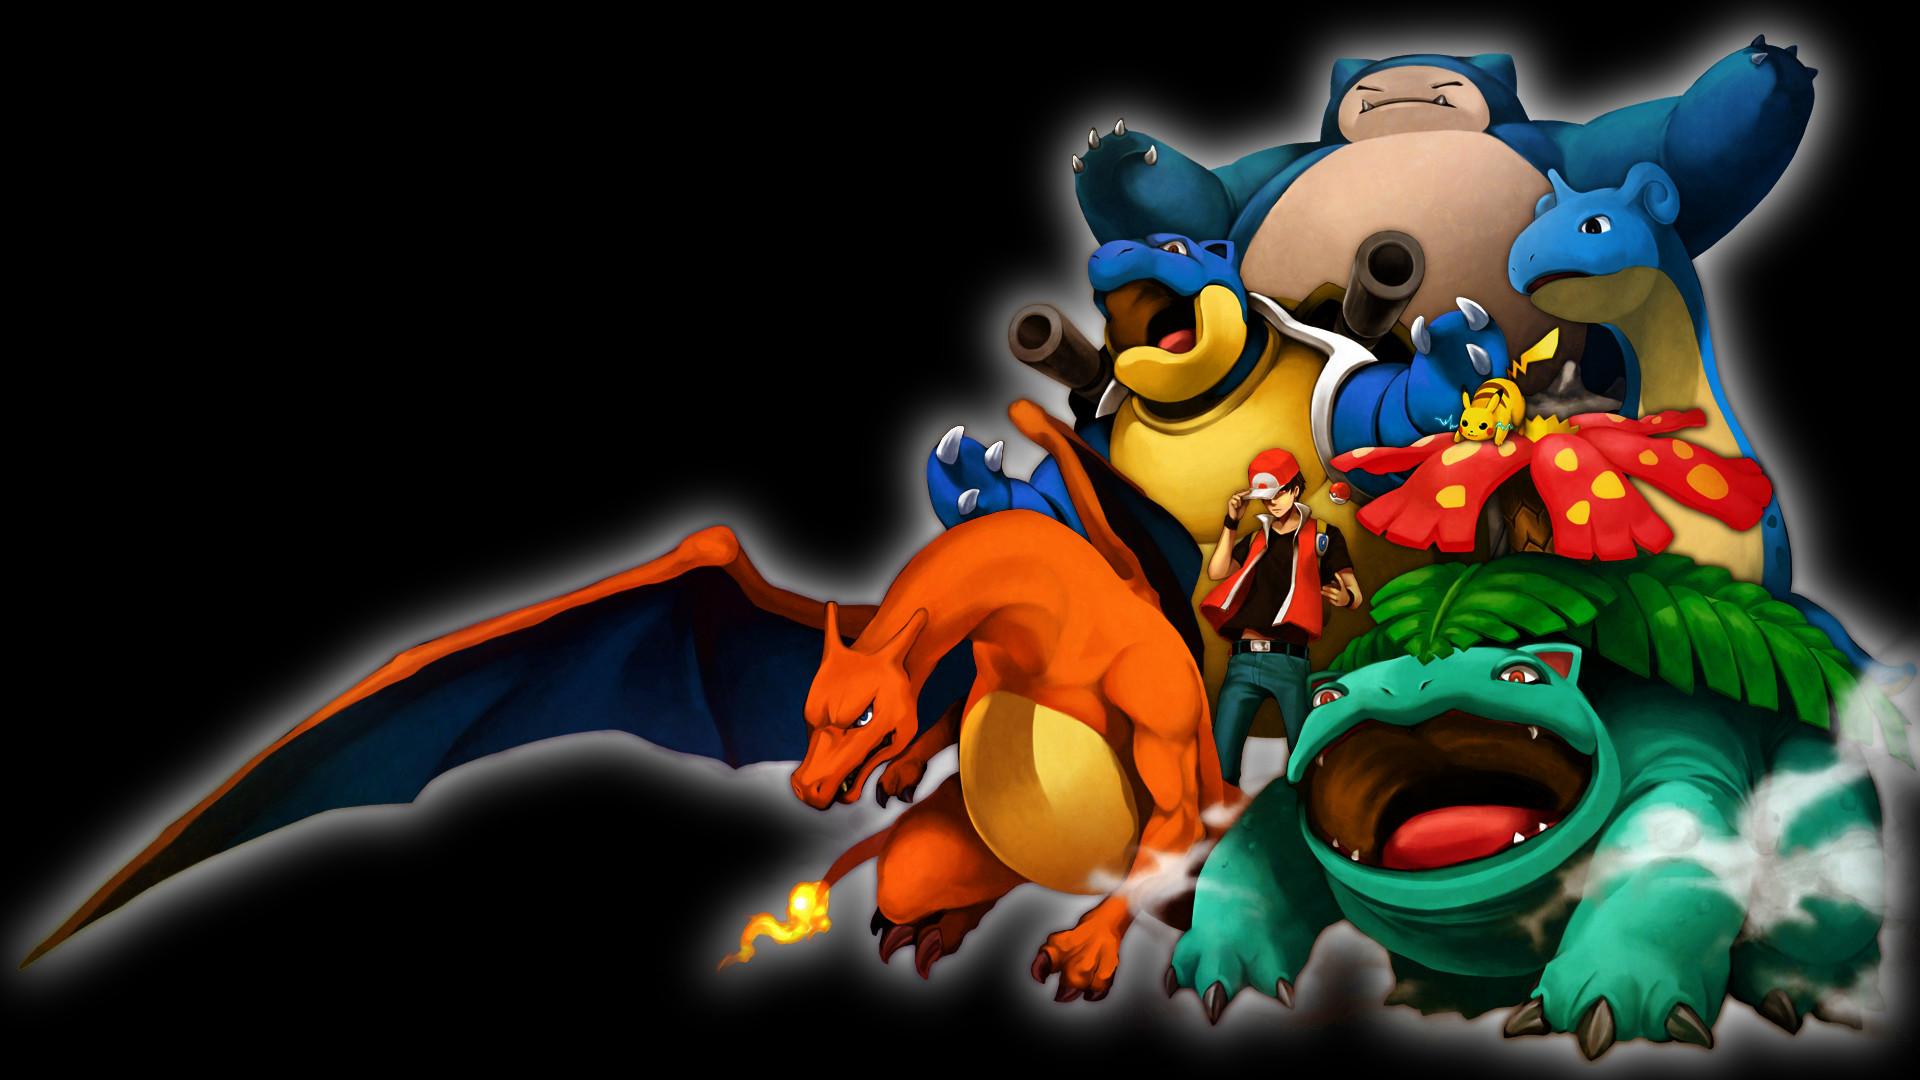 Free Pokemon Backgrounds